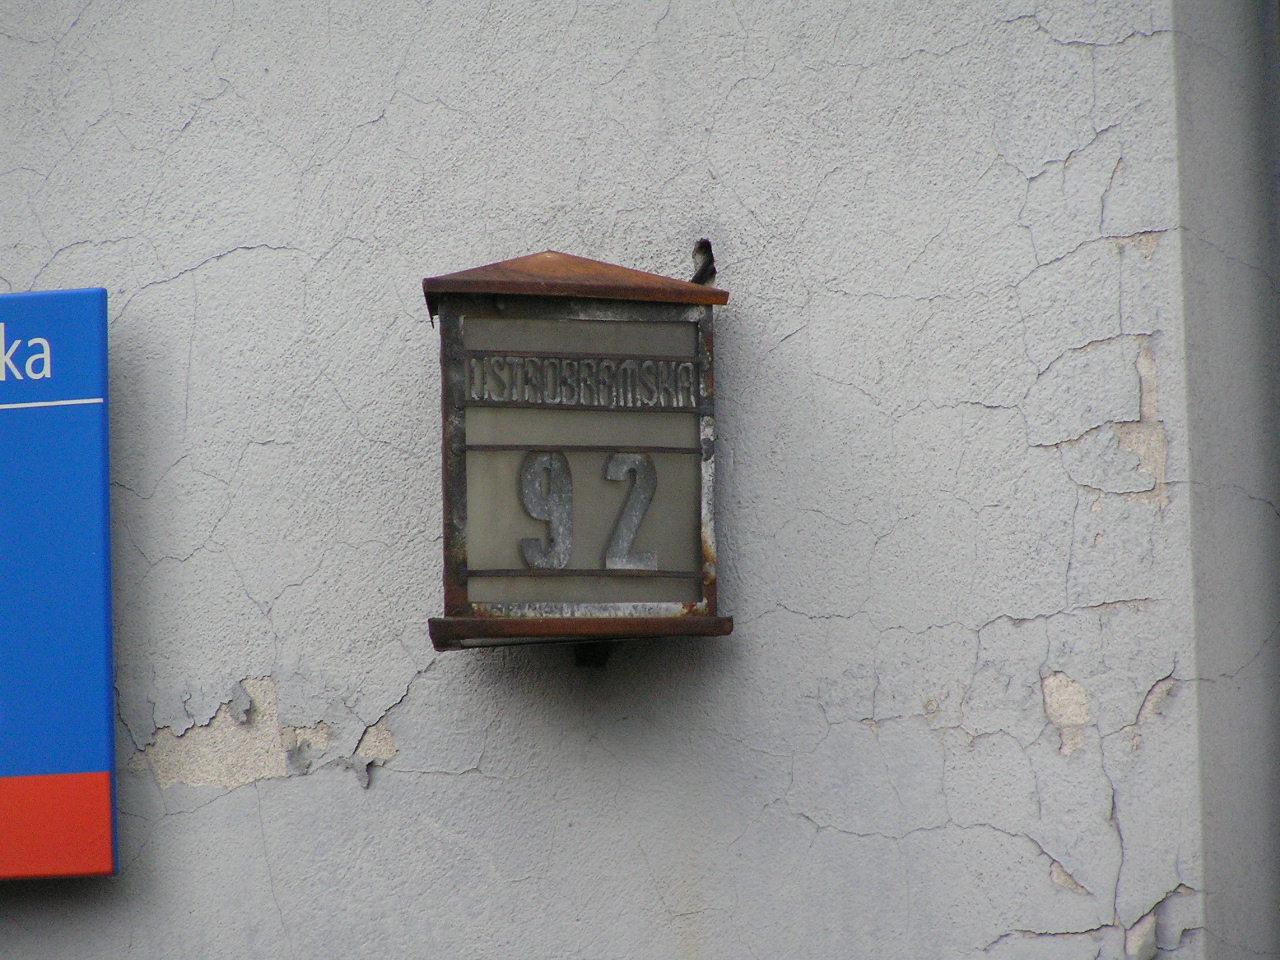 Latarenka adresowa - Ostrobramska 92